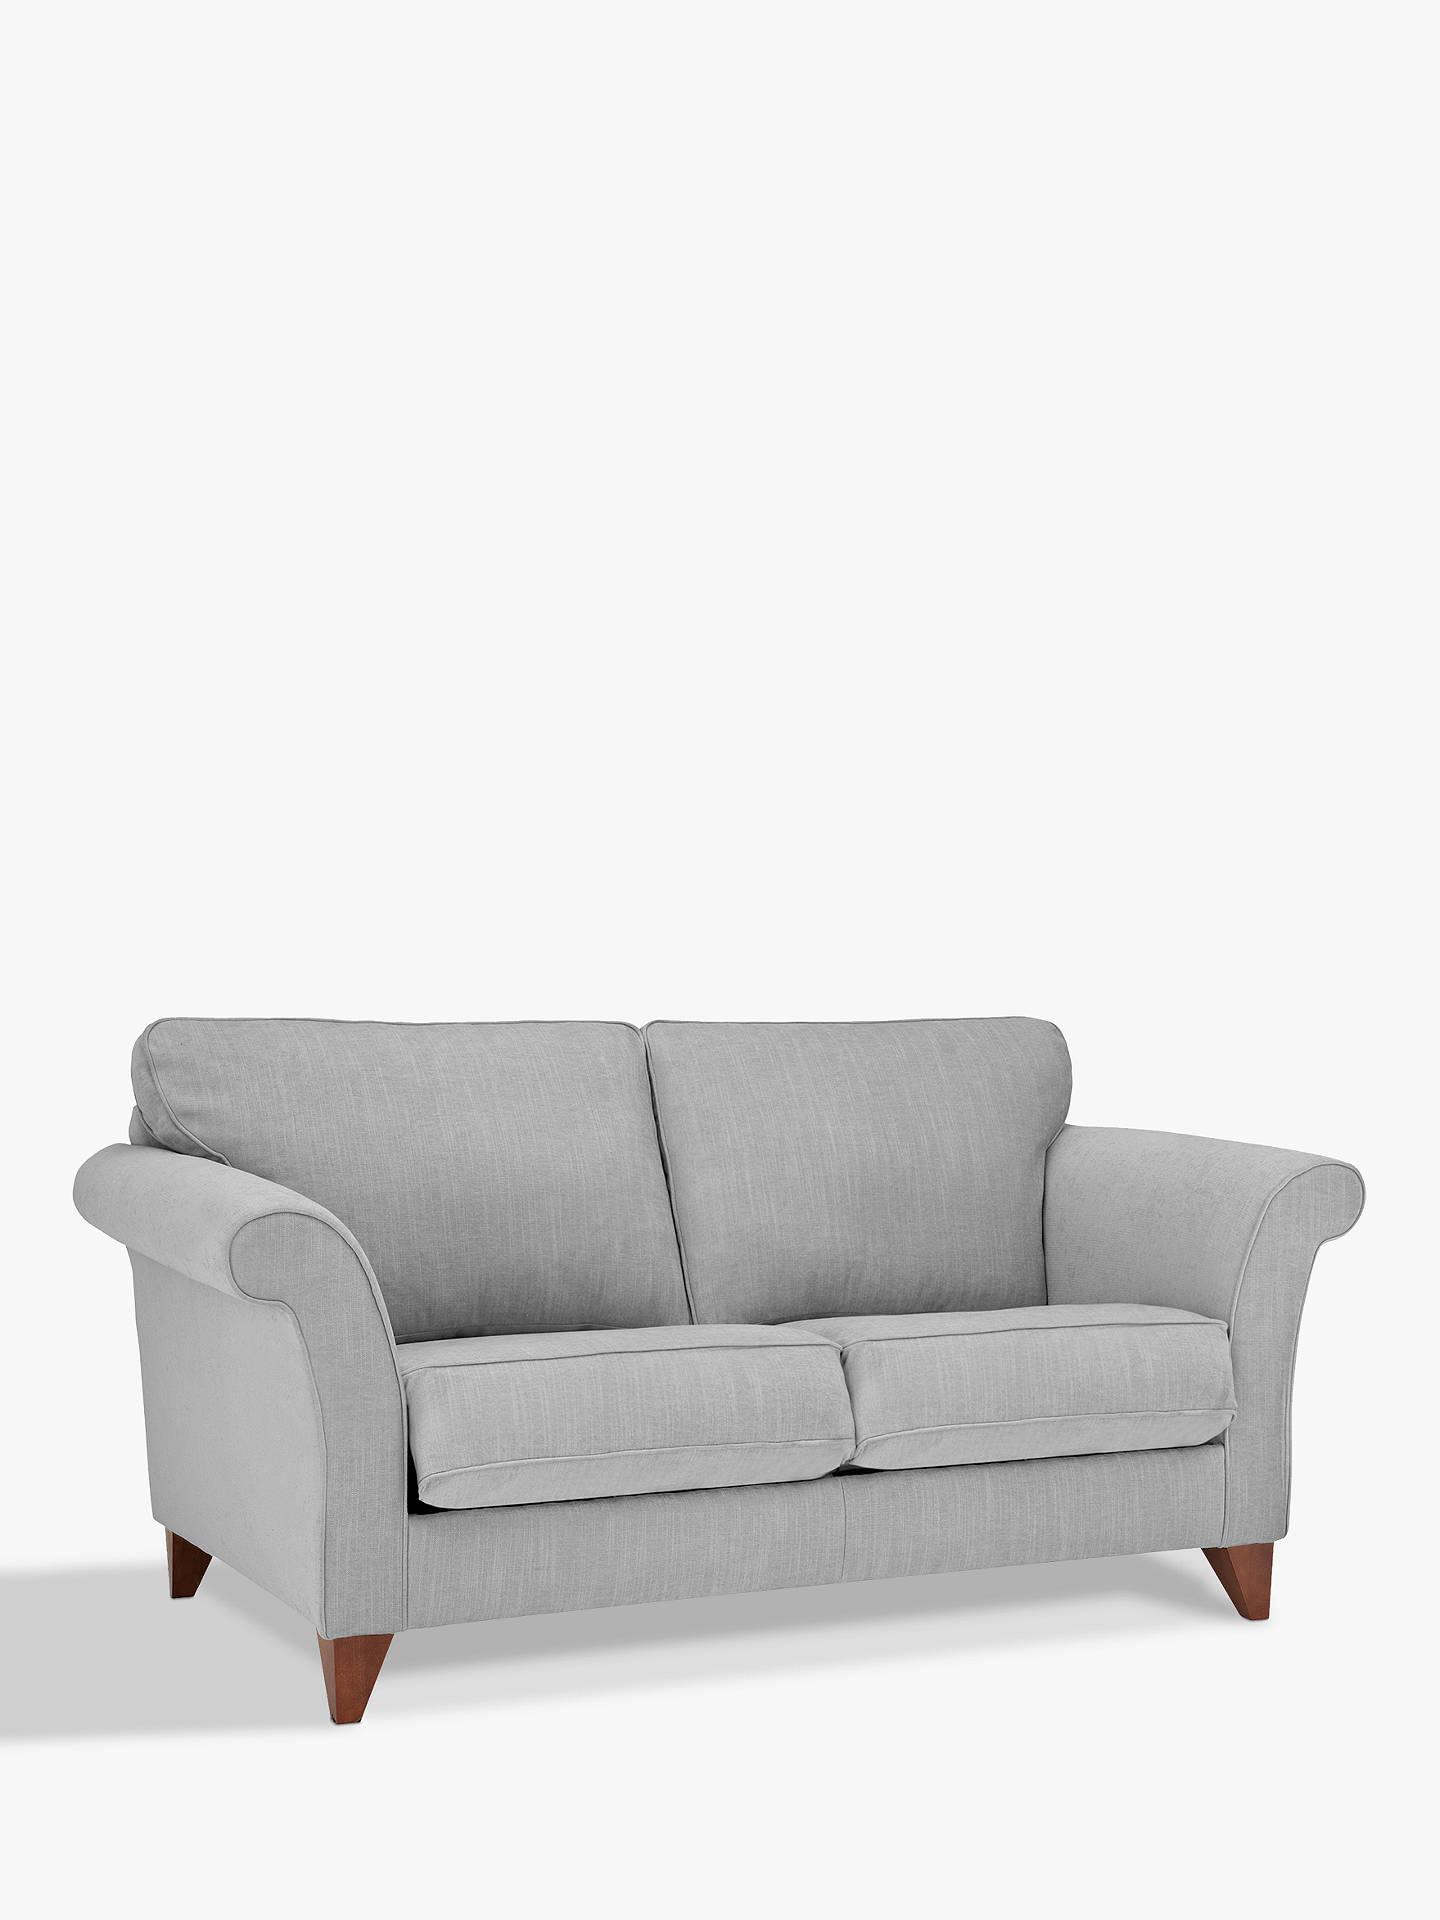 John Lewis Partners Charlotte Large 3 Seater Sofa